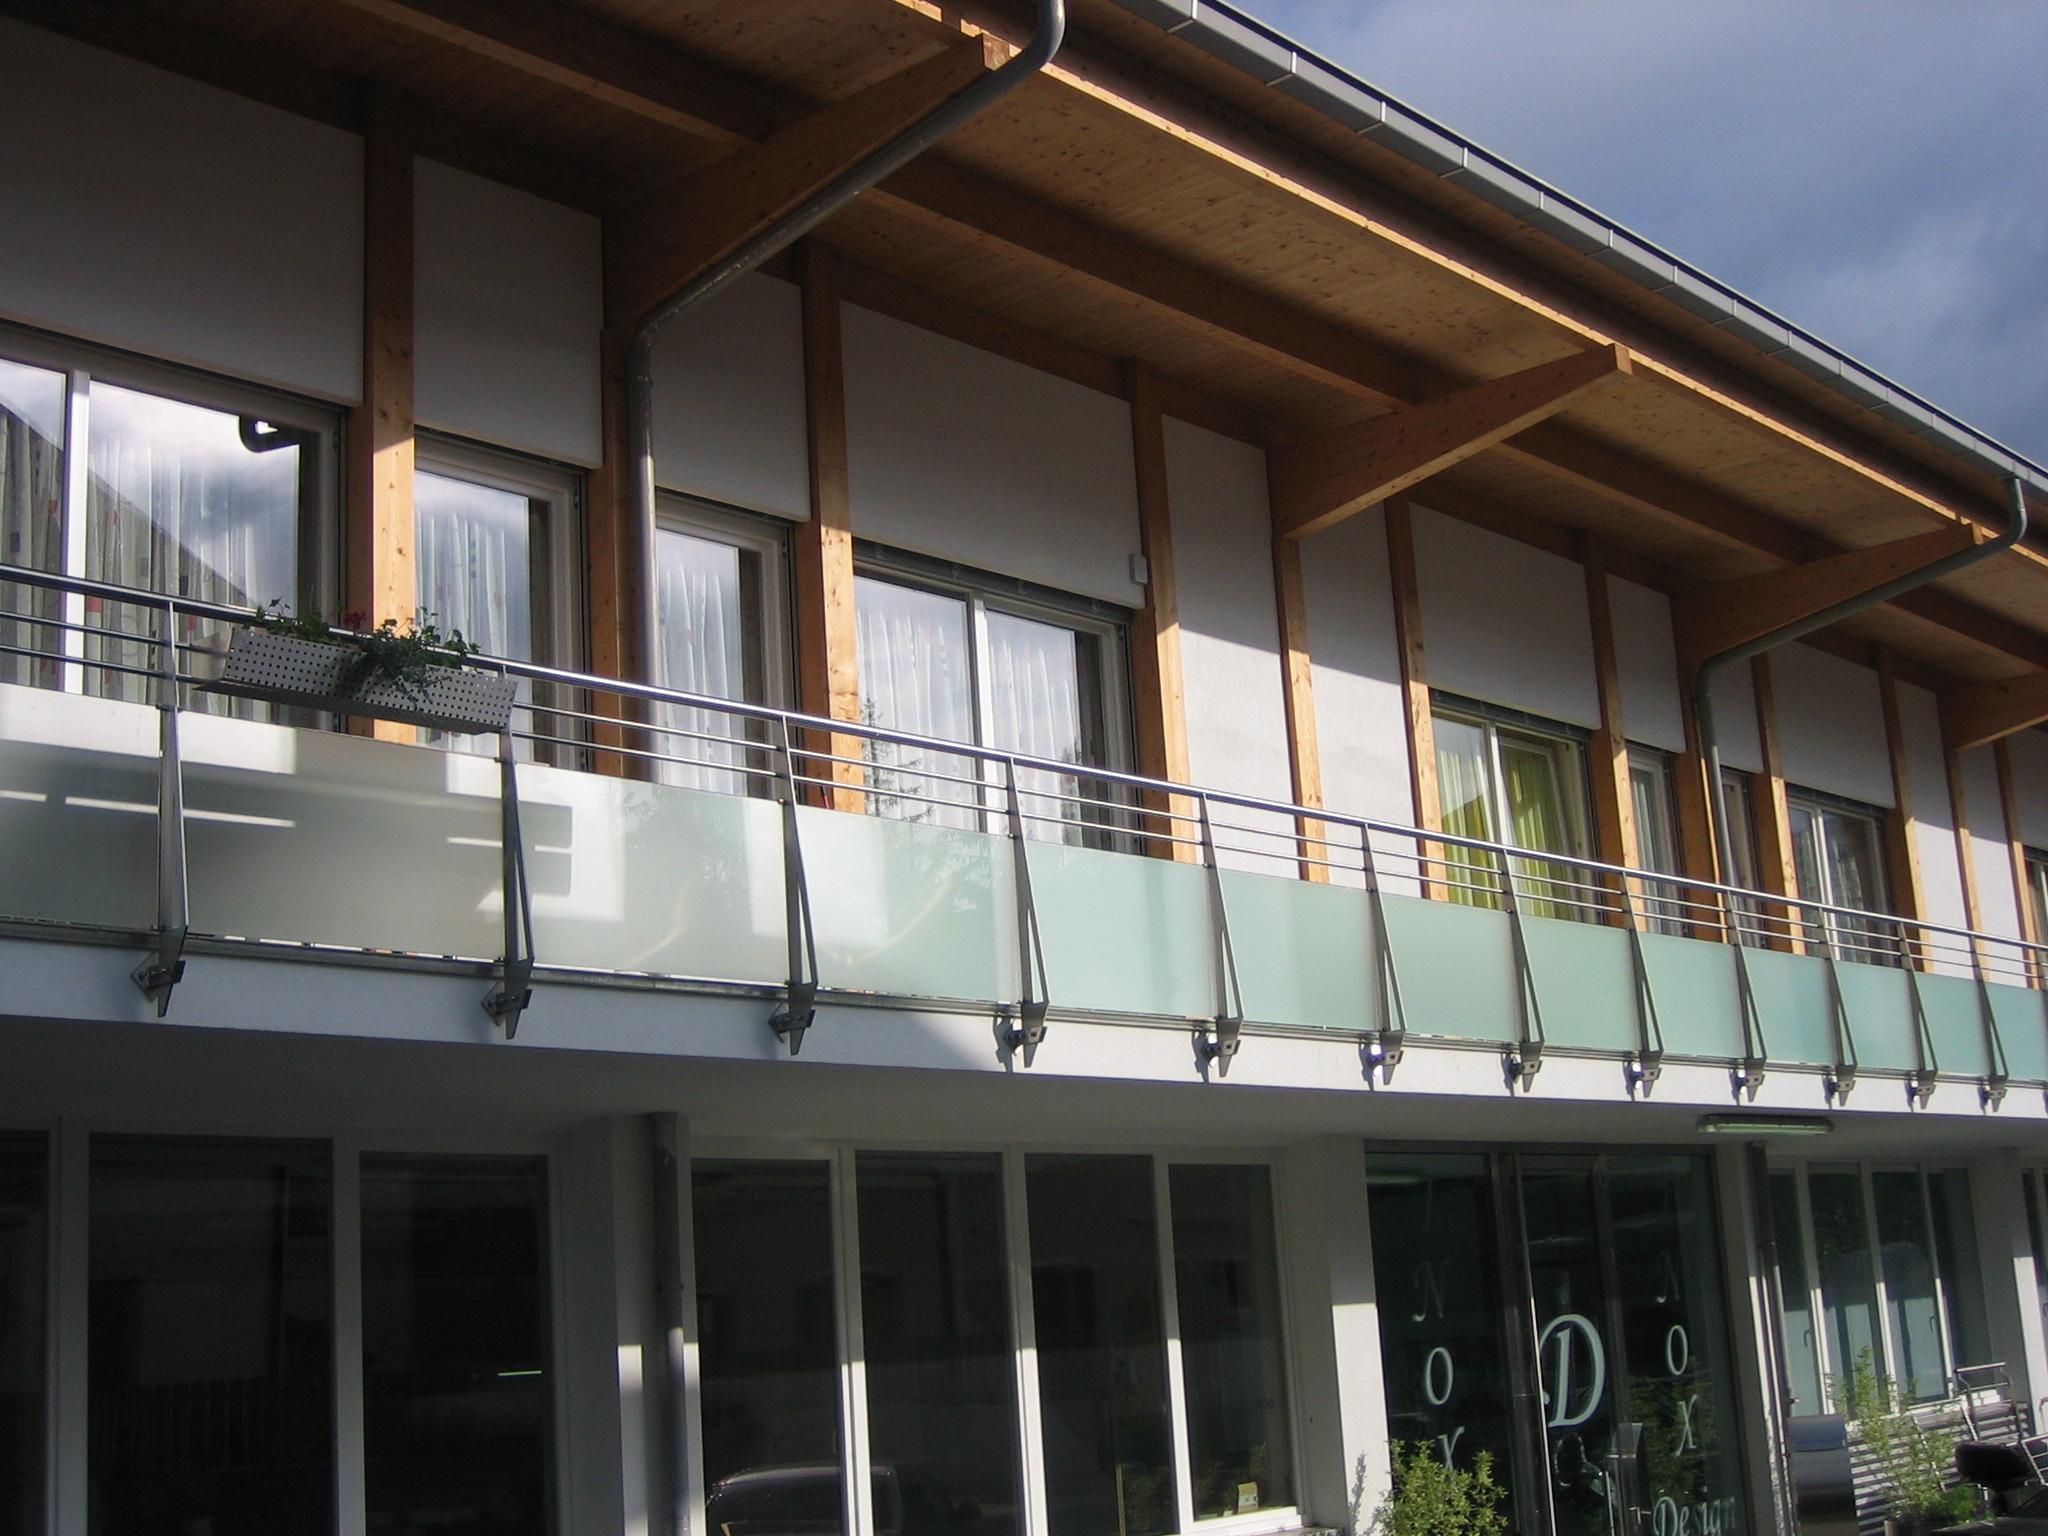 garde corps inox designgarde corps de balcons inoxdesign. Black Bedroom Furniture Sets. Home Design Ideas